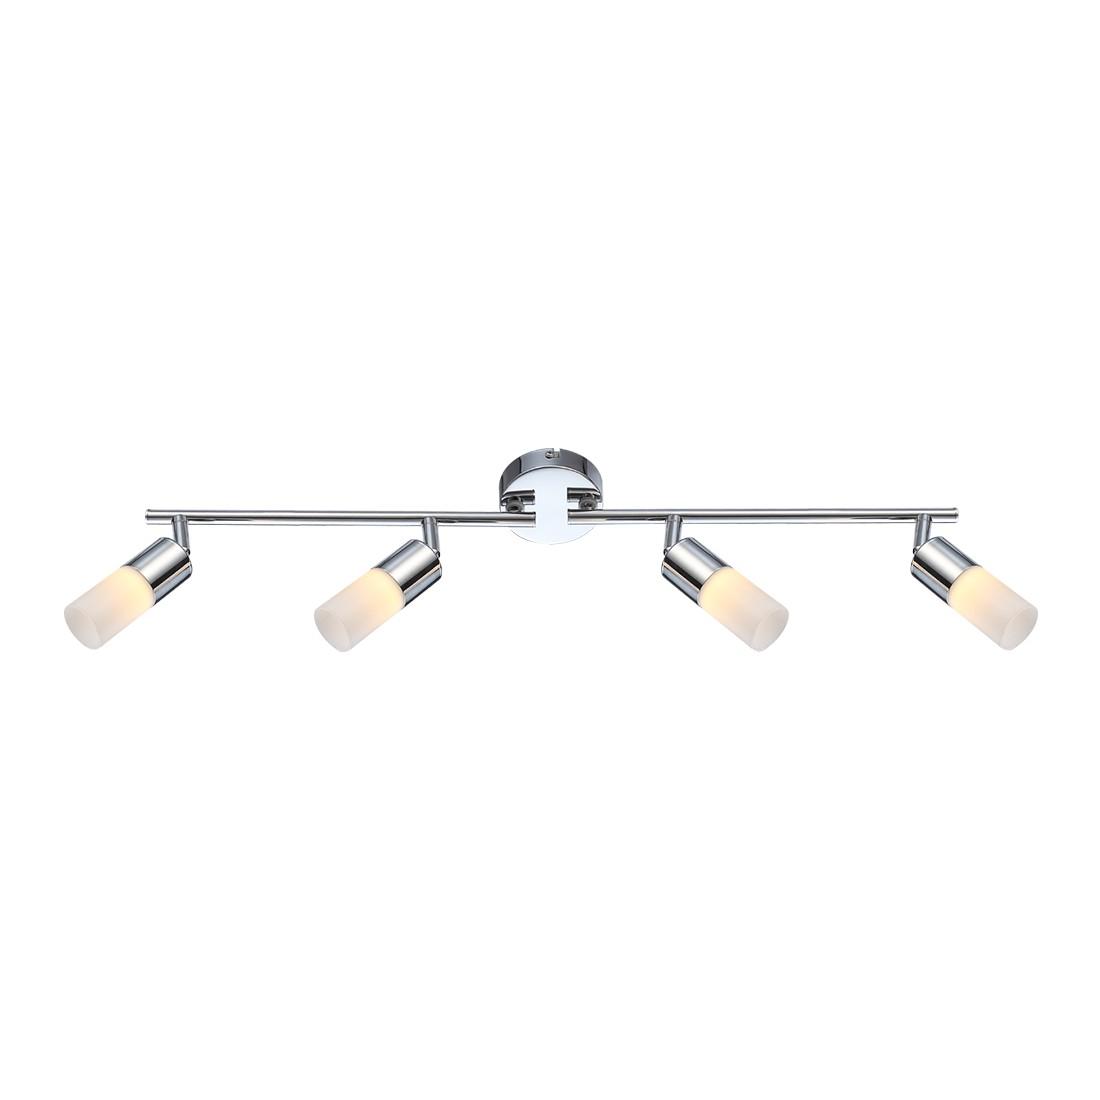 EEK A+, Deckenleuchte SPINA – Metall/Kunststoff – 4-flammig, Globo Lighting günstig bestellen